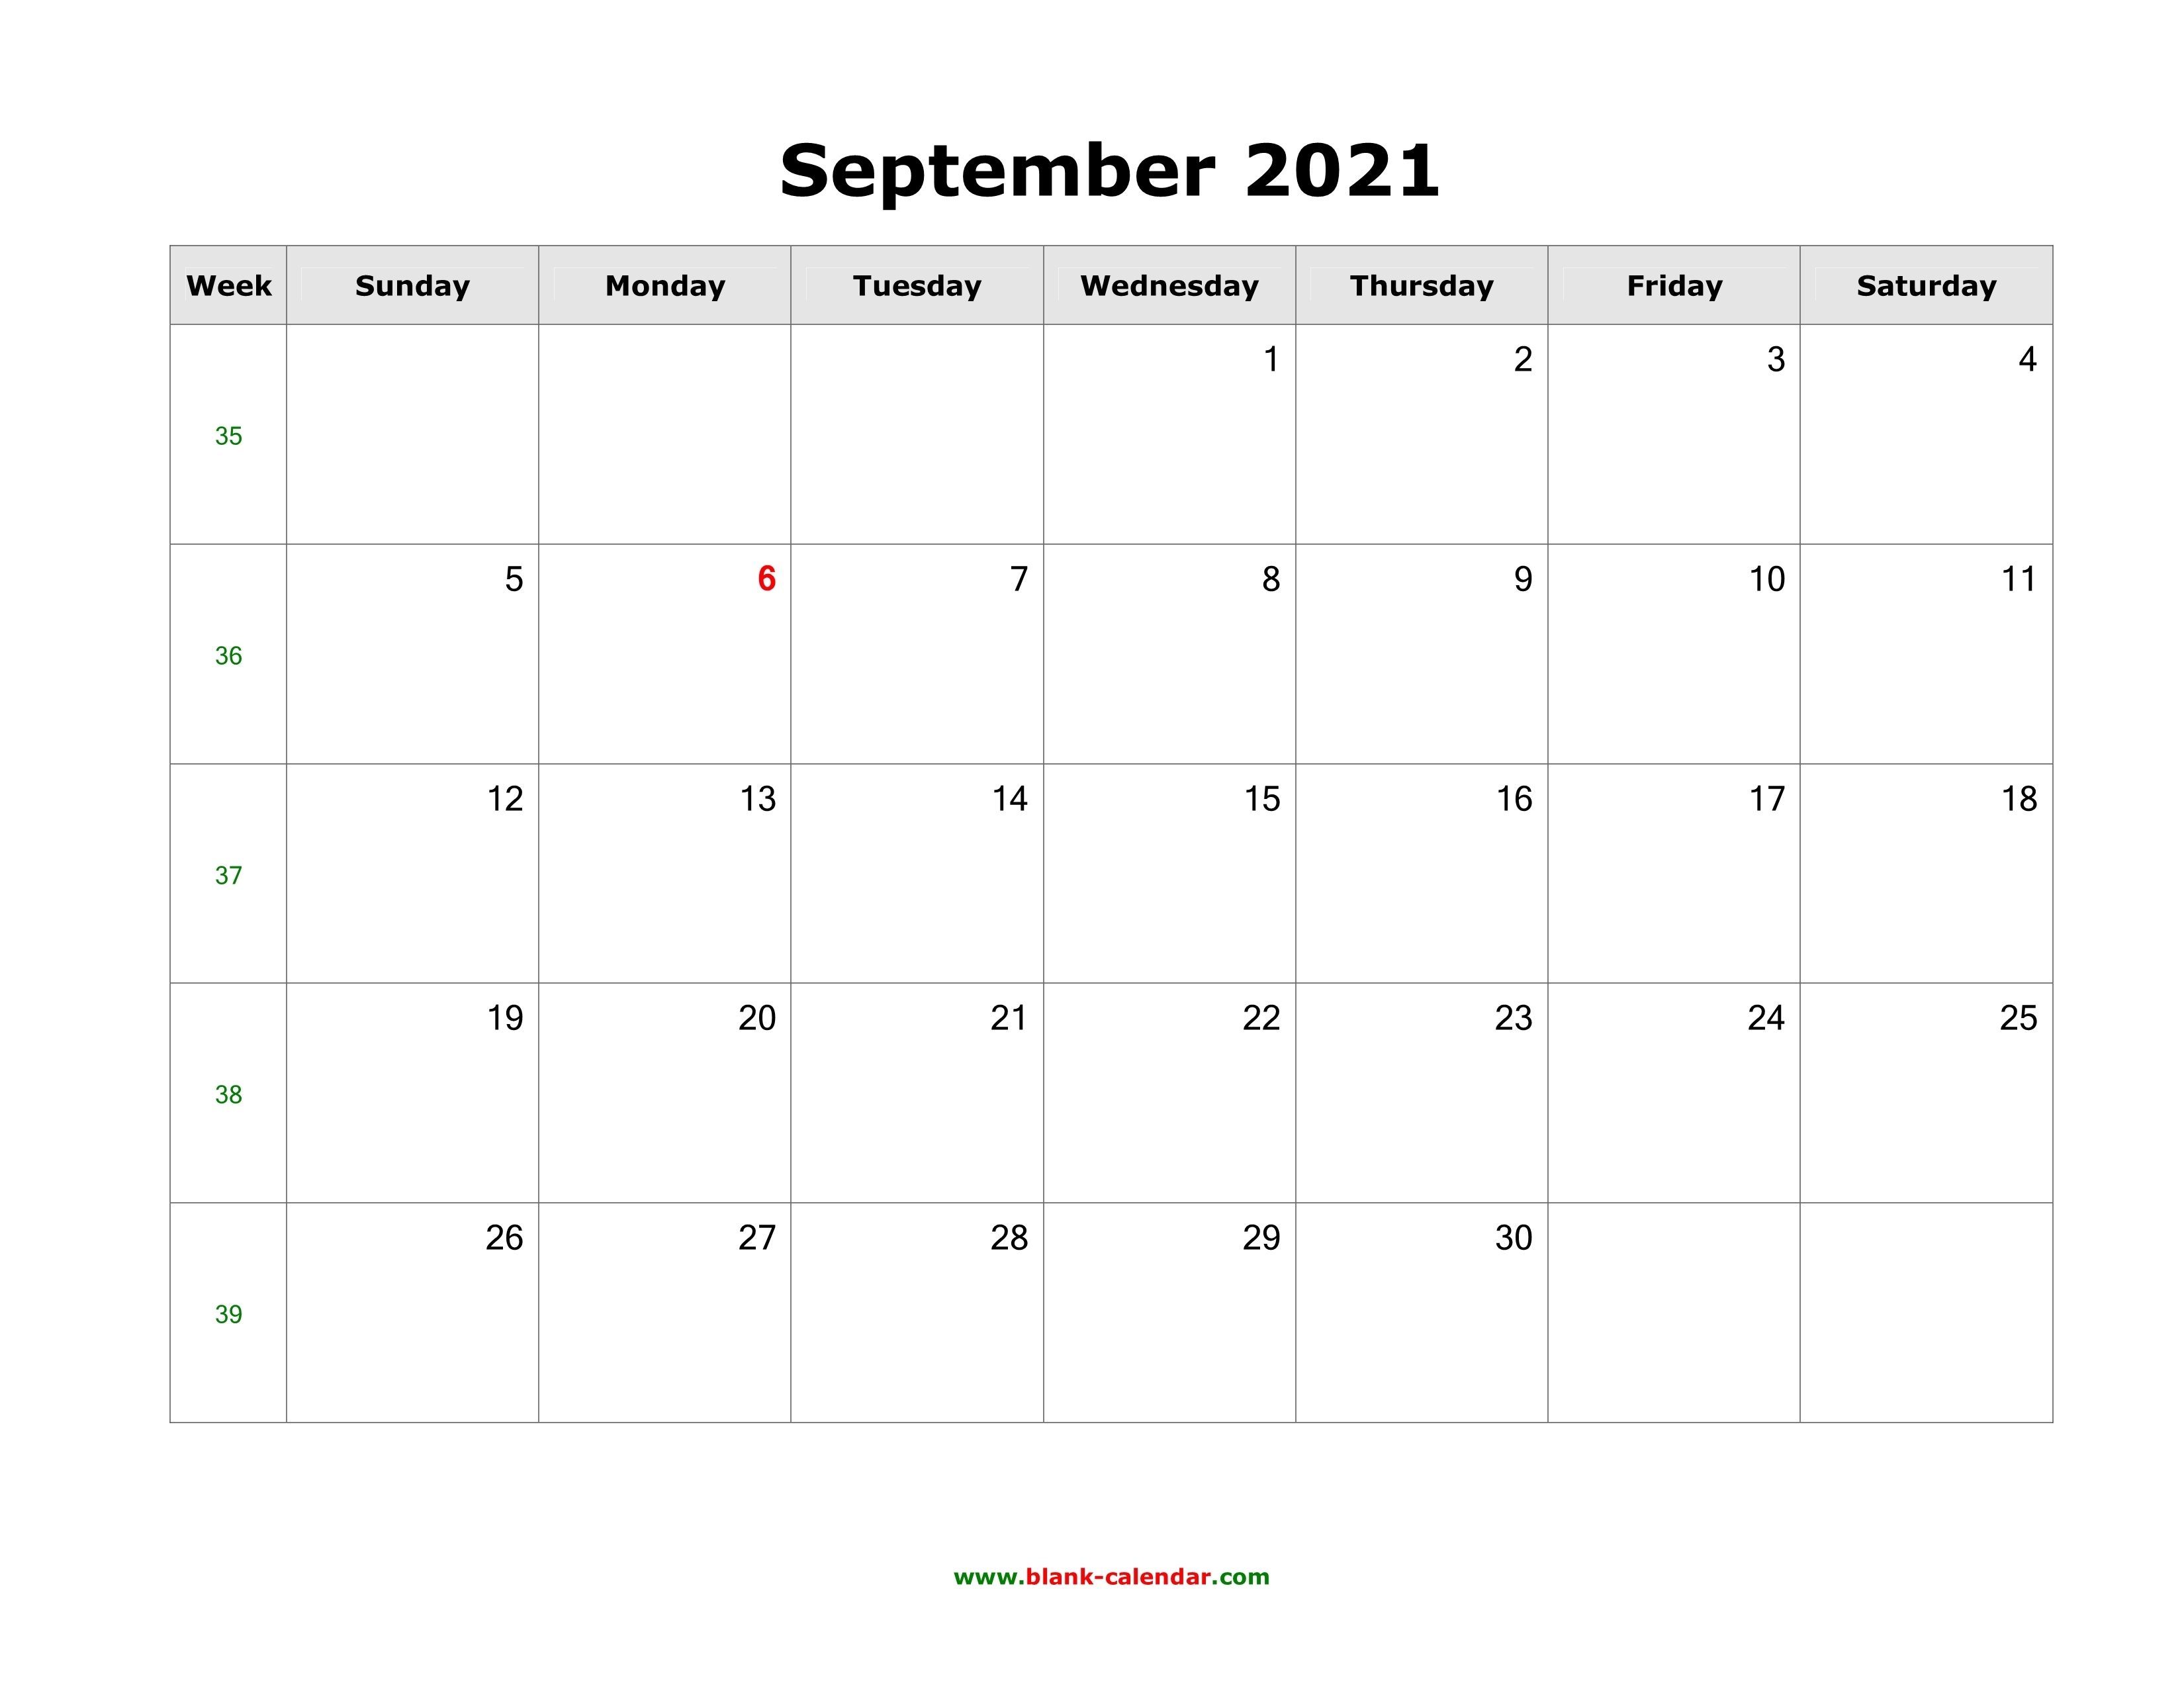 Download September 2021 Blank Calendar (Horizontal) 2021 Calendar September Month